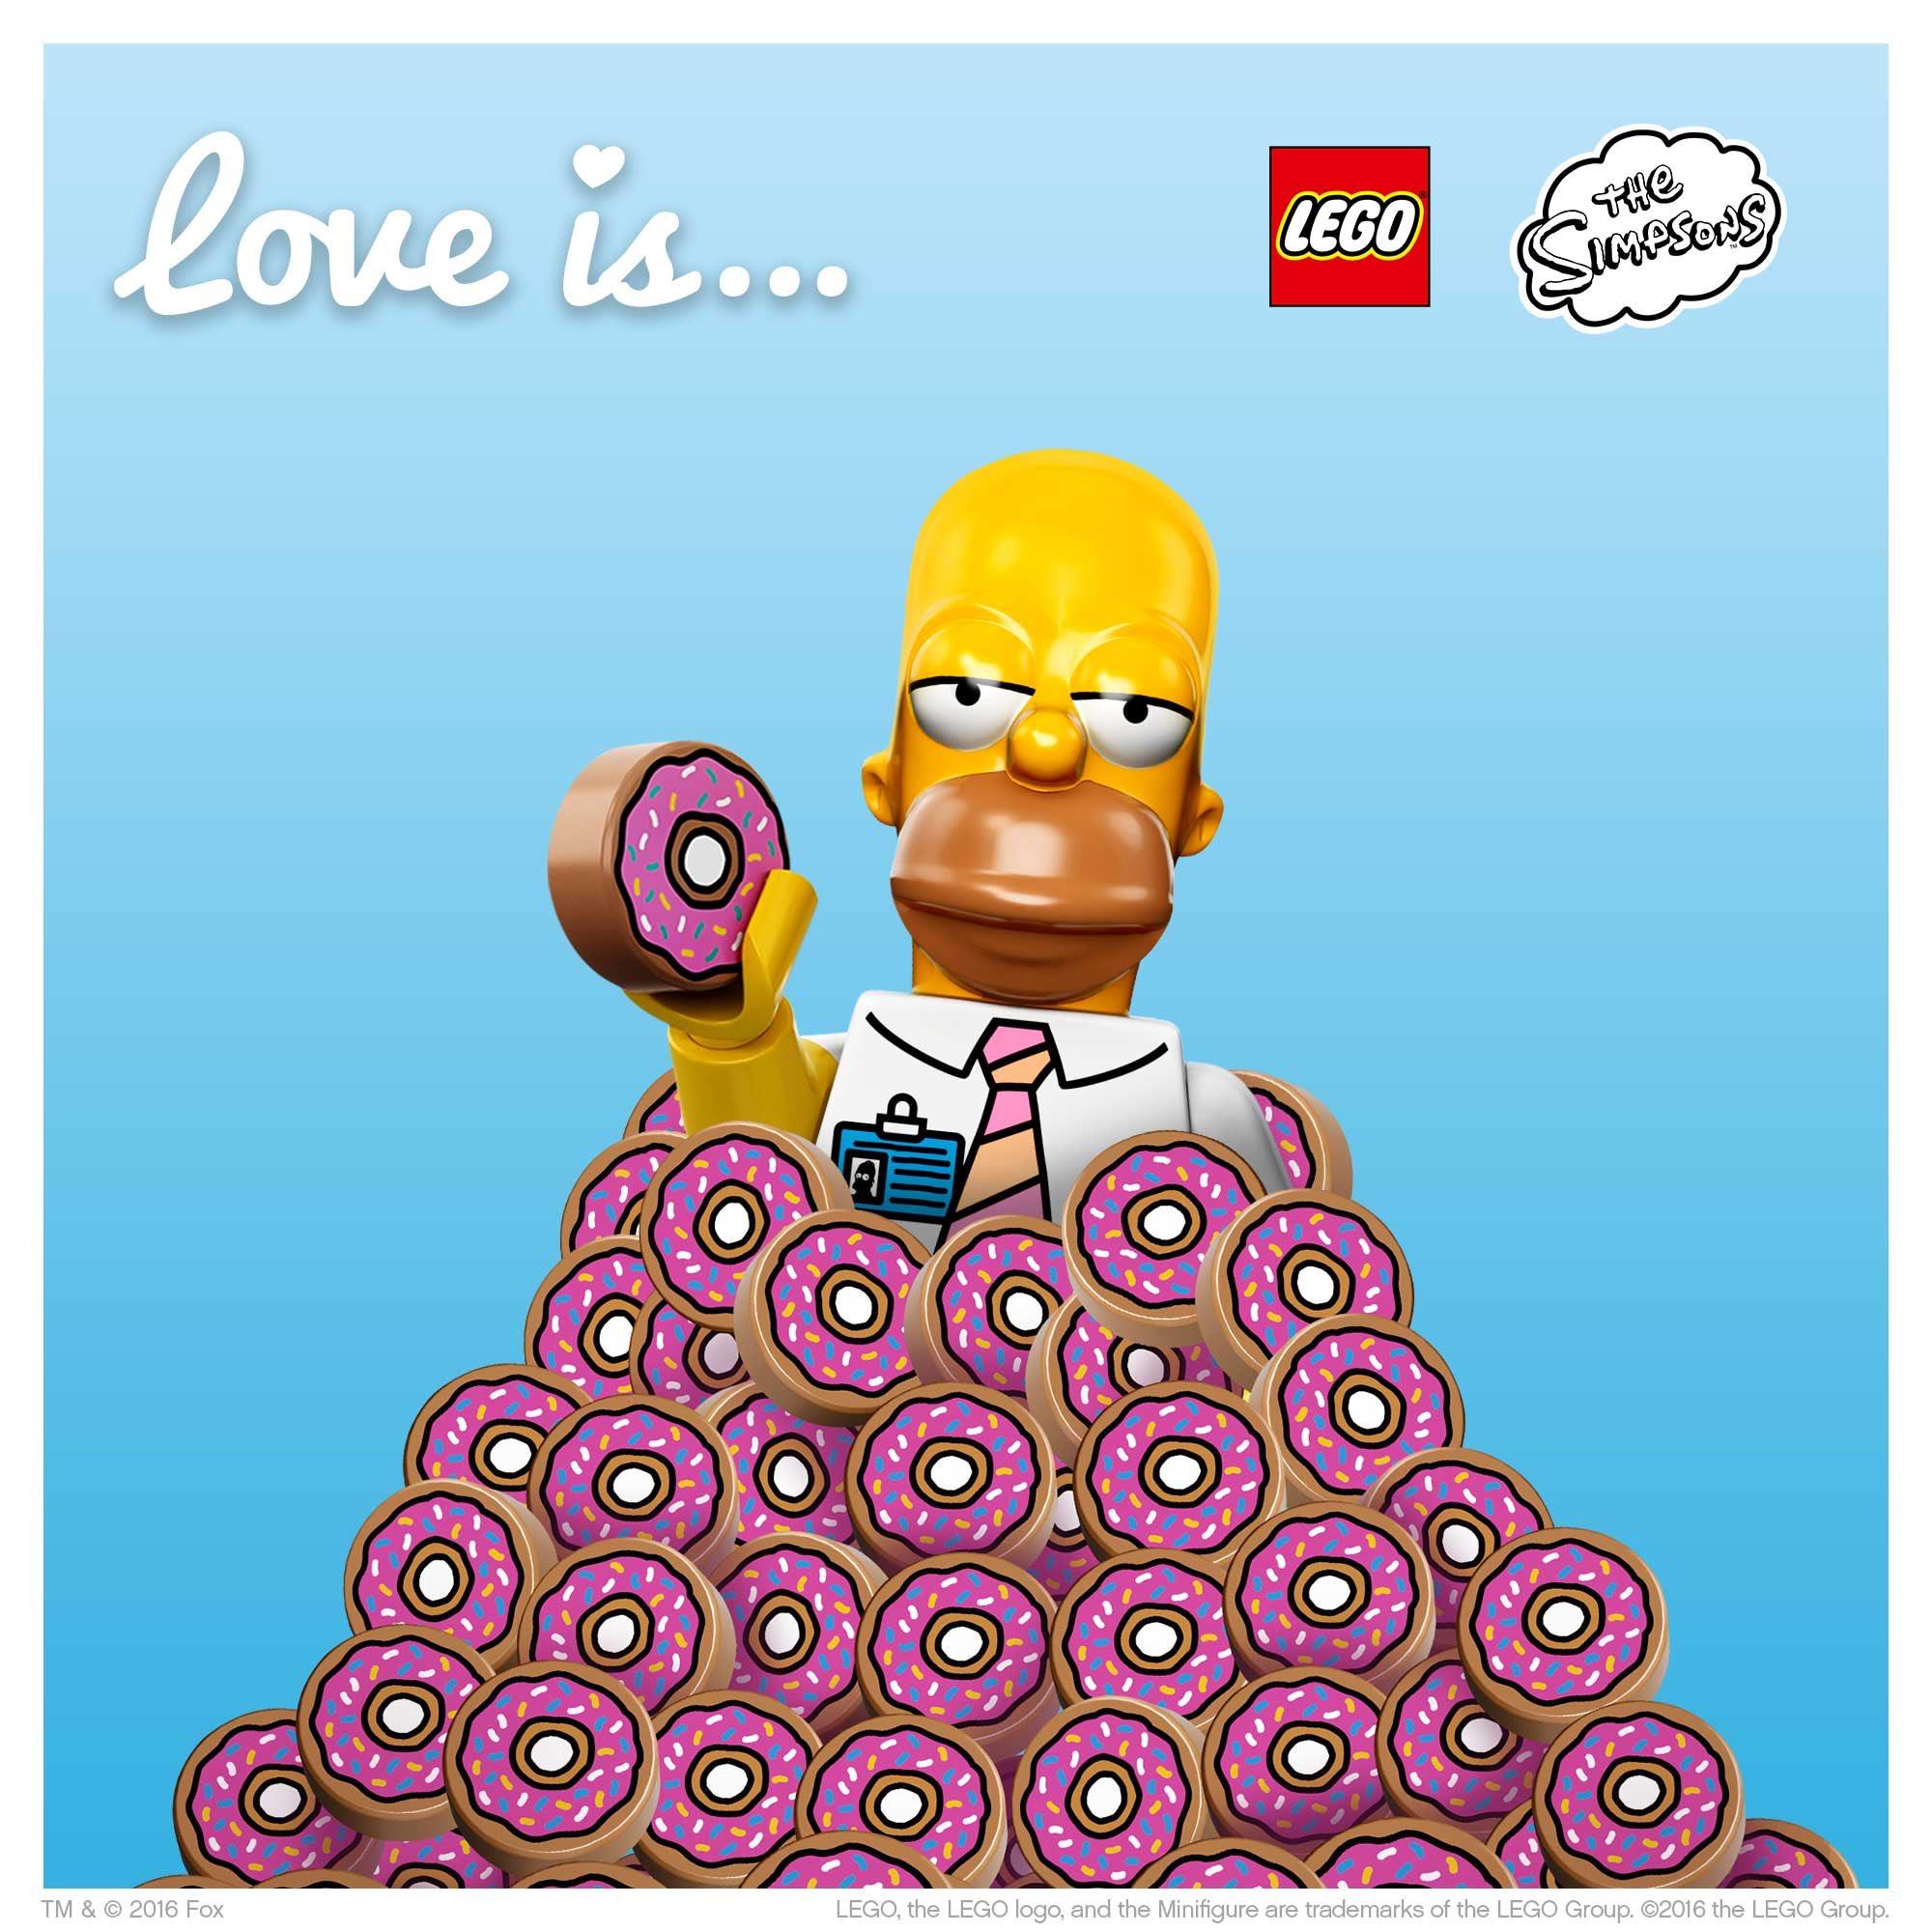 Love is… #LEGOLove #Valentines https://t.co/1UtQdbCLes